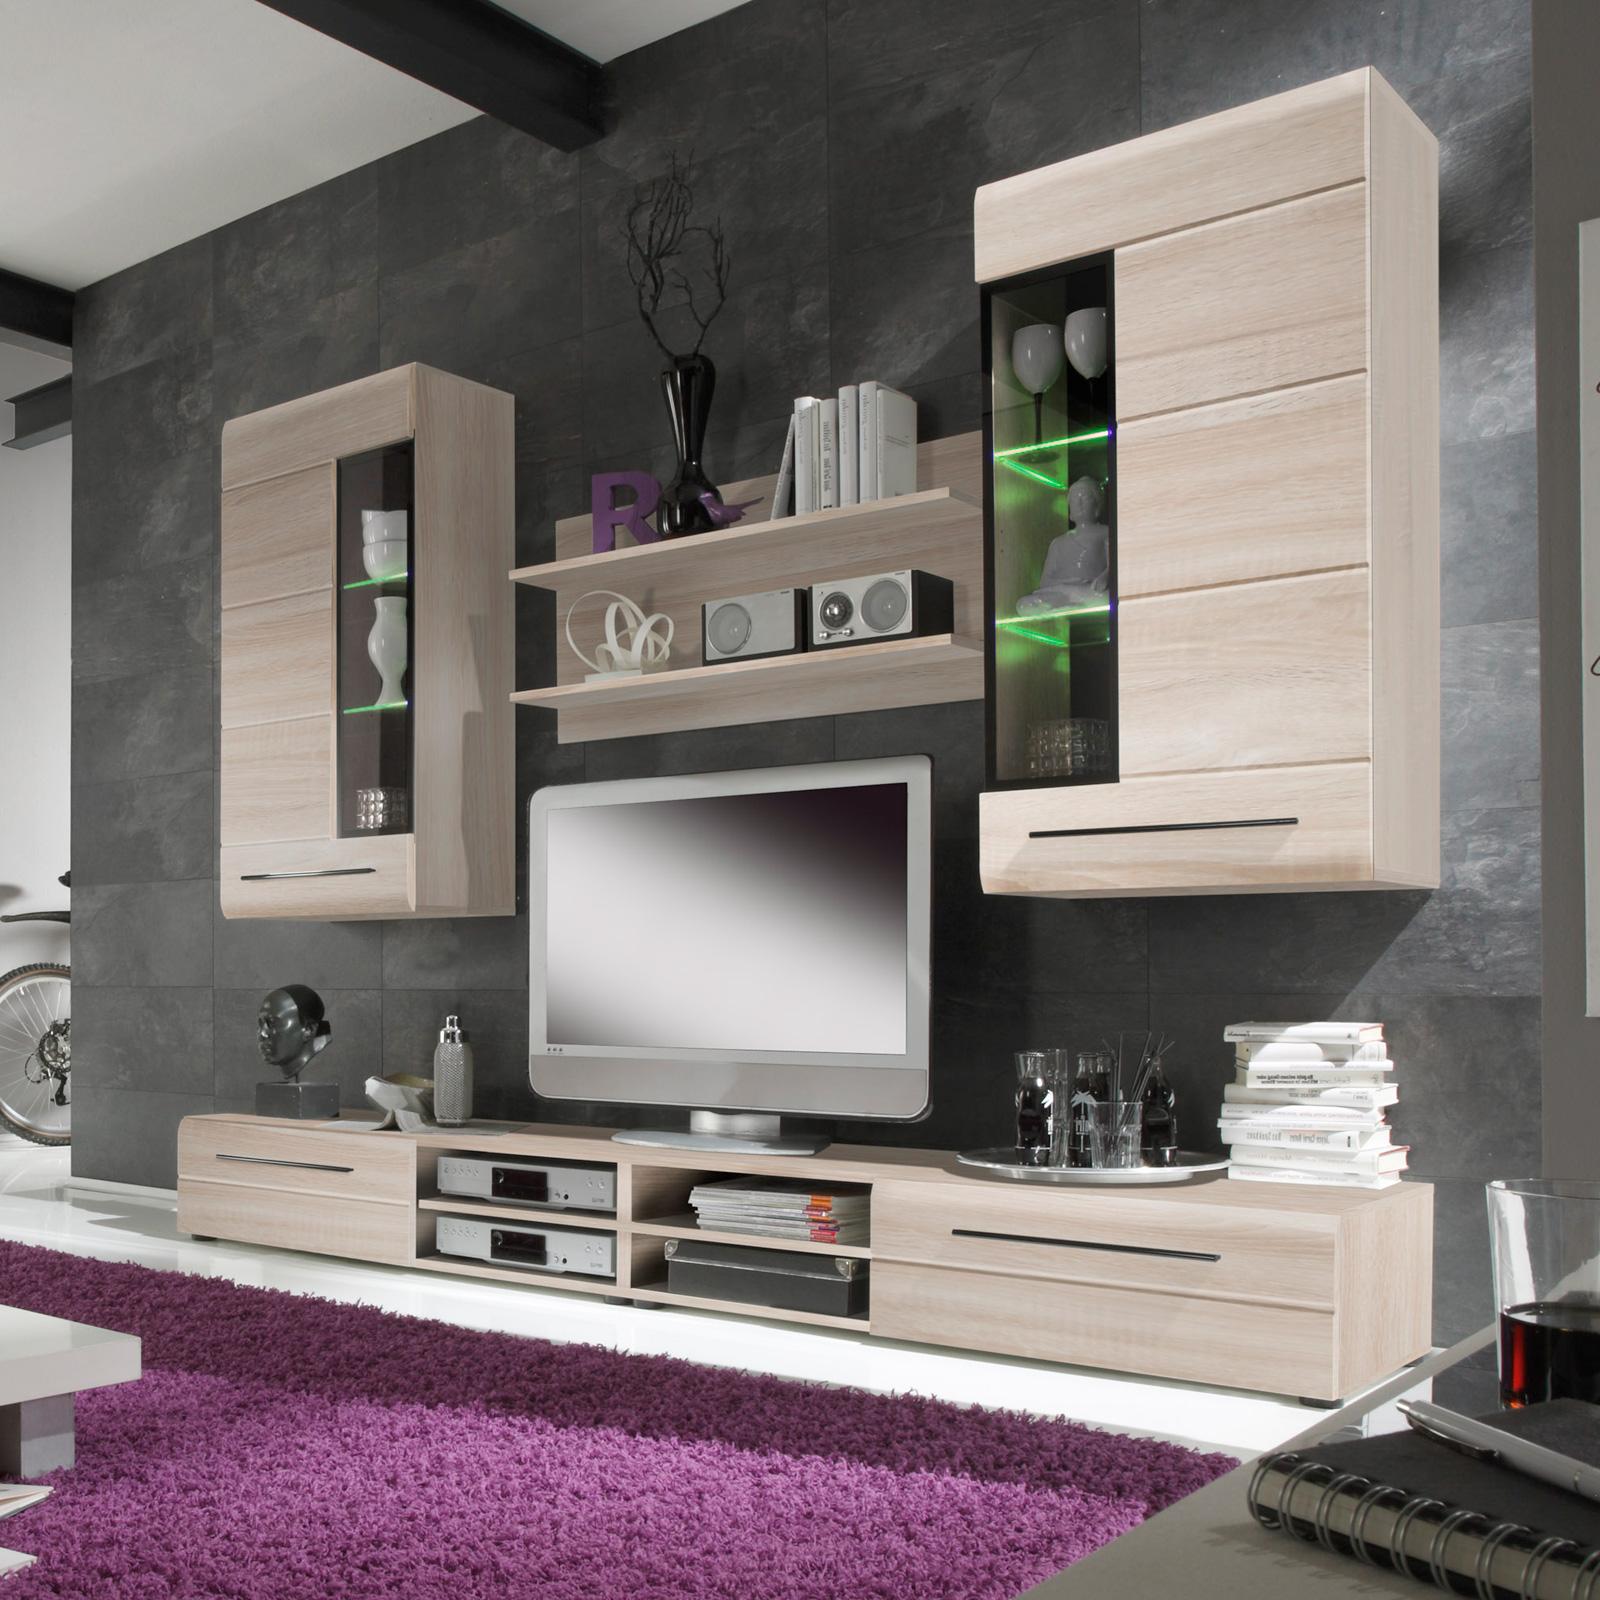 wohnwand skin 2 wohnzimmer anbauwand in eiche s gerau hell mit led beleuchtung ebay. Black Bedroom Furniture Sets. Home Design Ideas